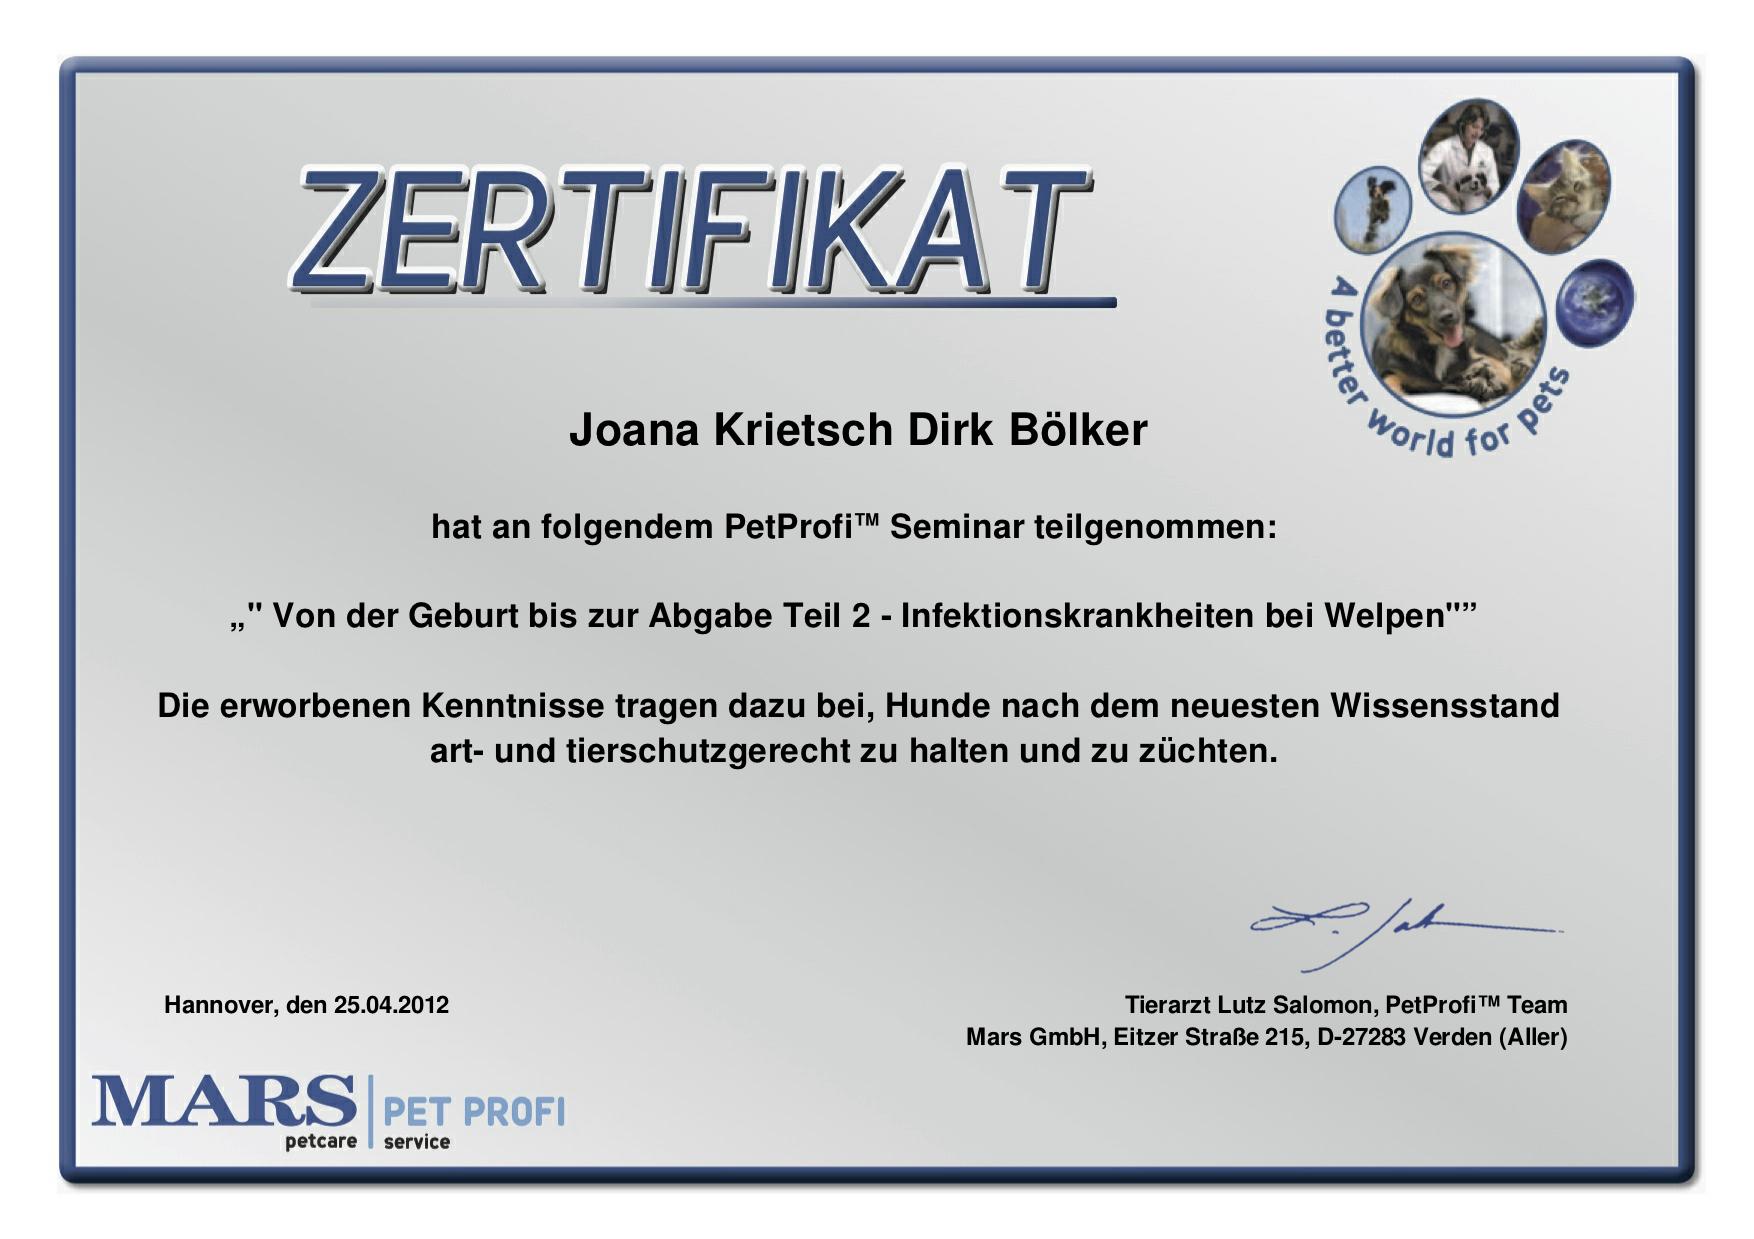 20180605-124924_Zertifikat